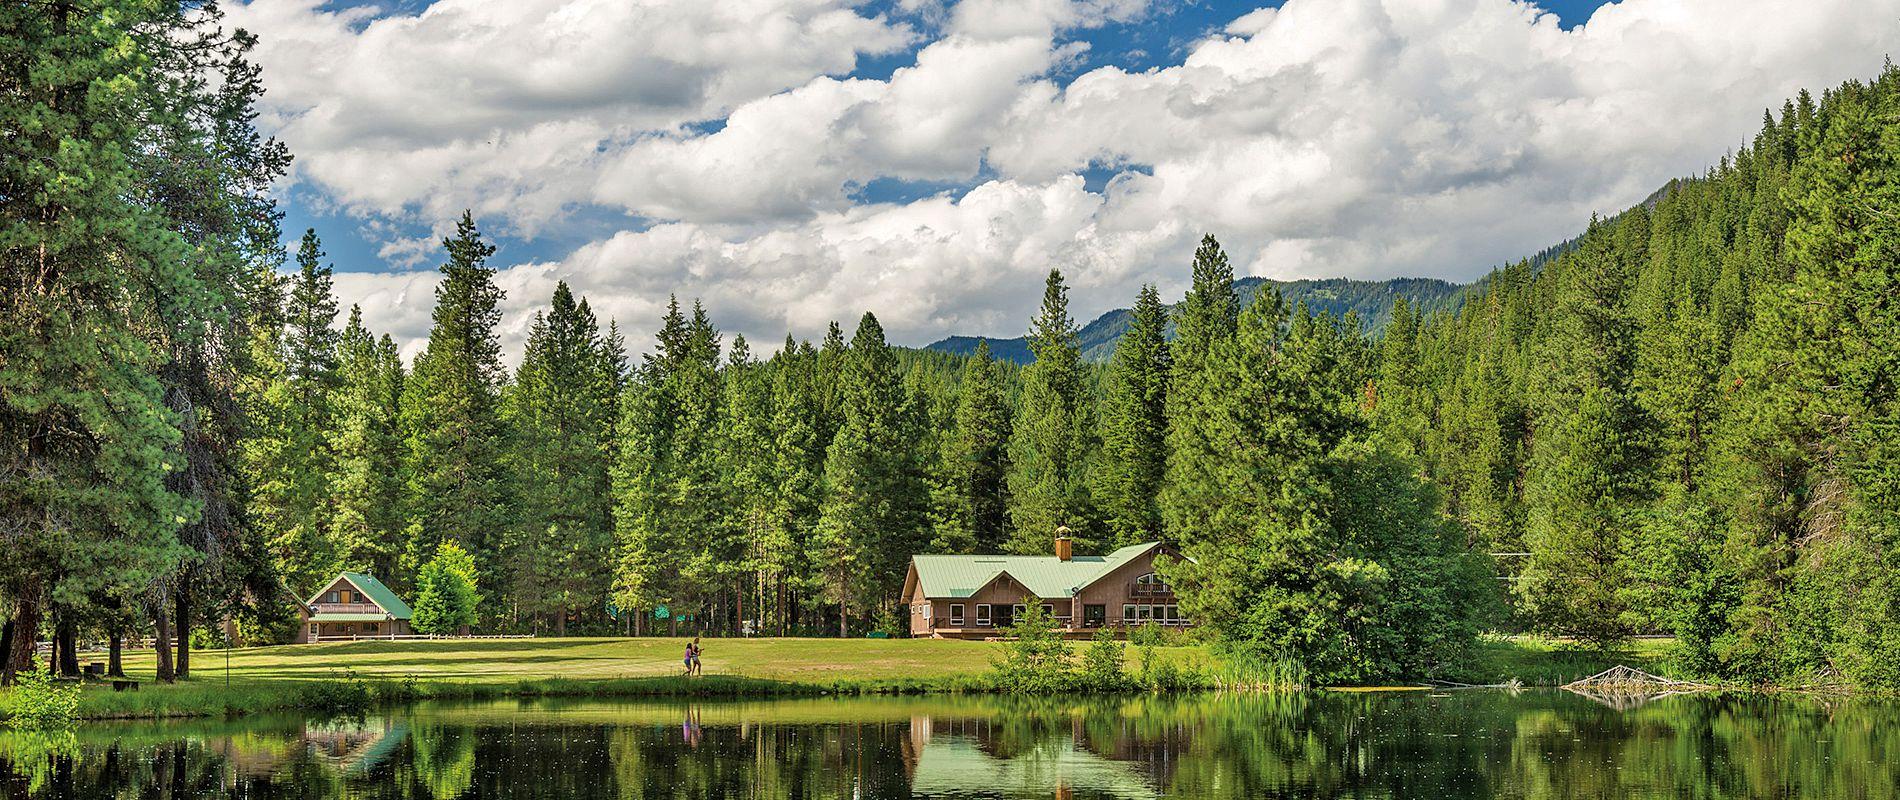 Leavenworth RV Resort and Campground